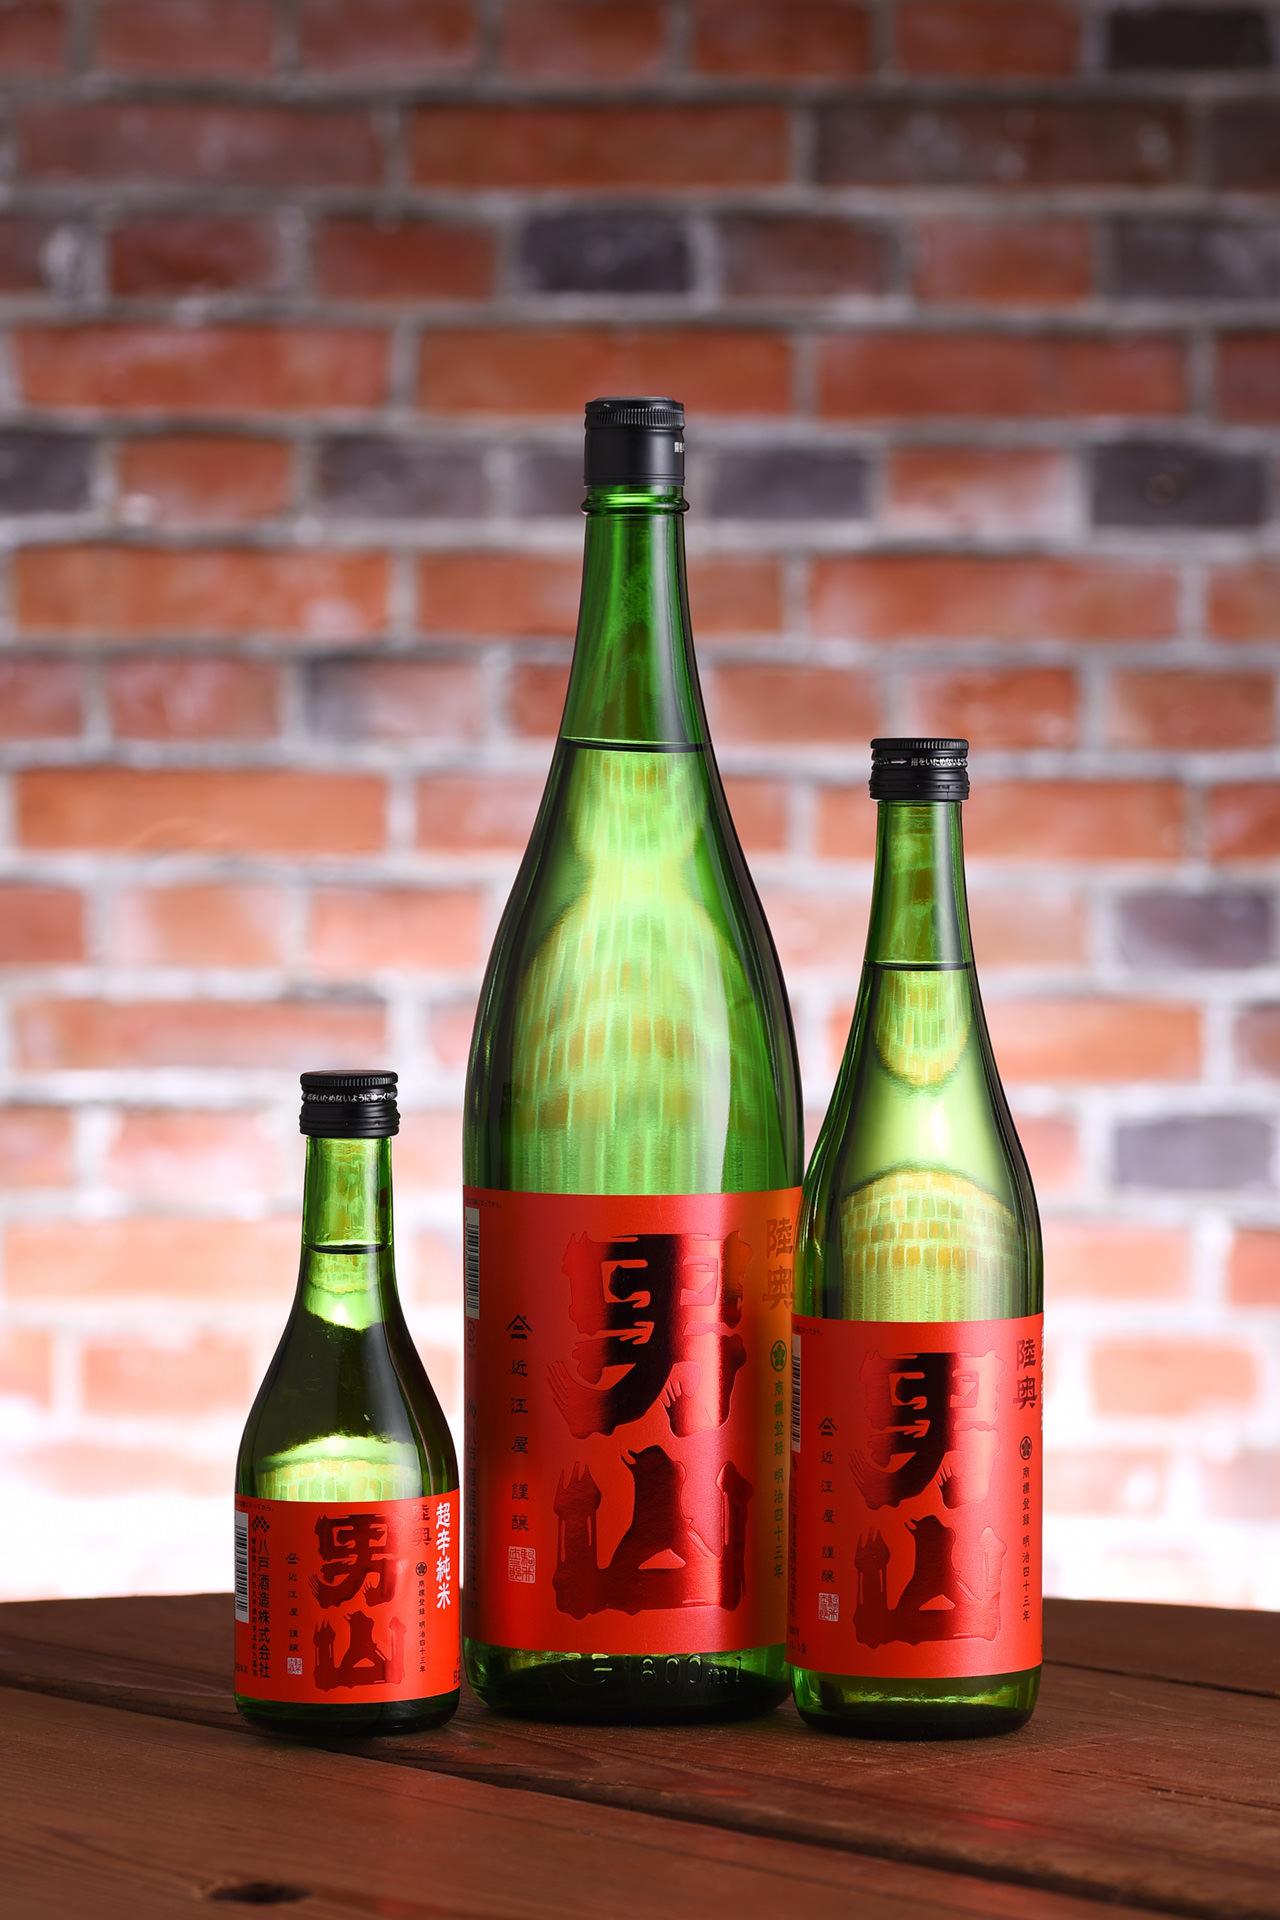 Mutsu Otokoyama Chokara (Super Dry) Junmai